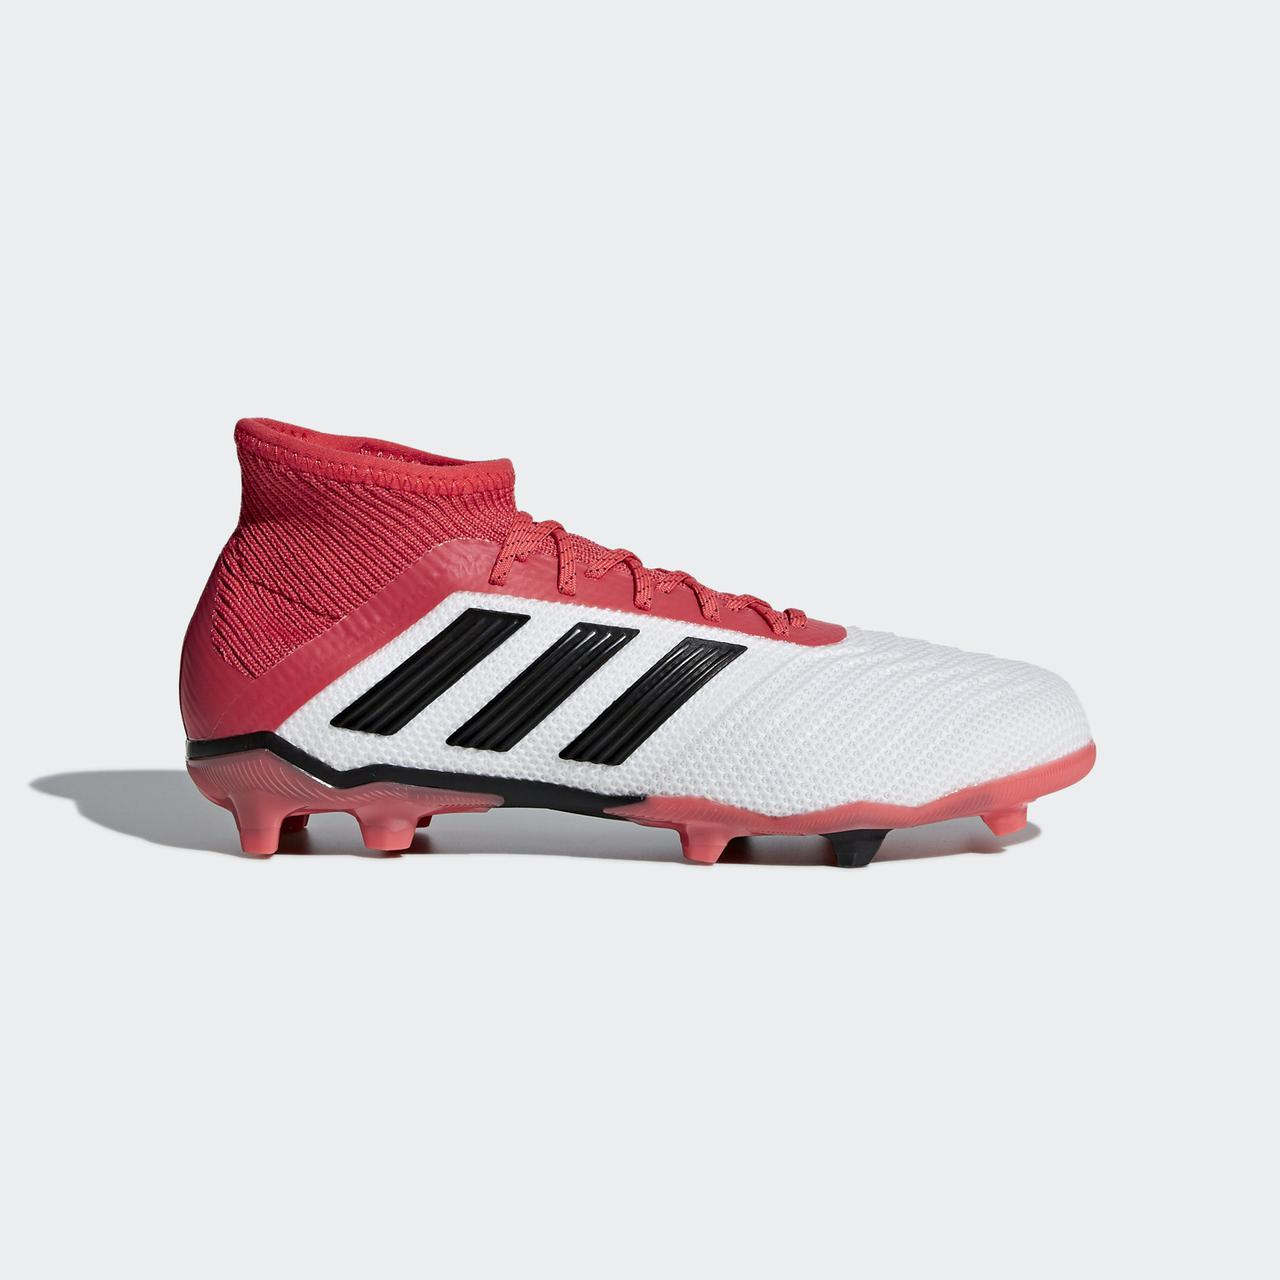 8d7f797ea67d Детские футбольные бутсы Adidas Performance Predator 18.1 FG (Артикул   CP8873) - Интернет-